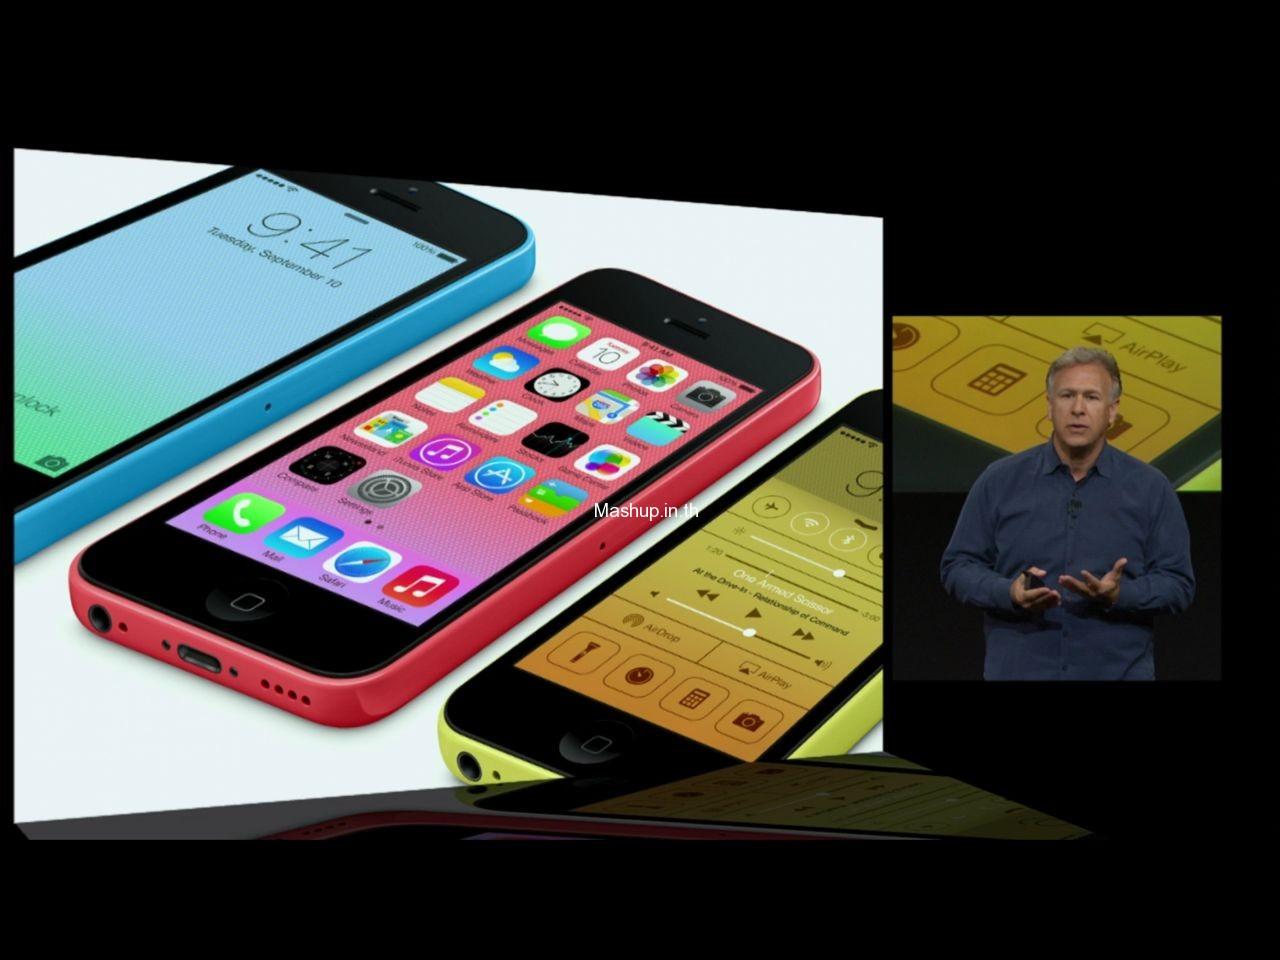 iPhone 5C ทั้ง 5 สี